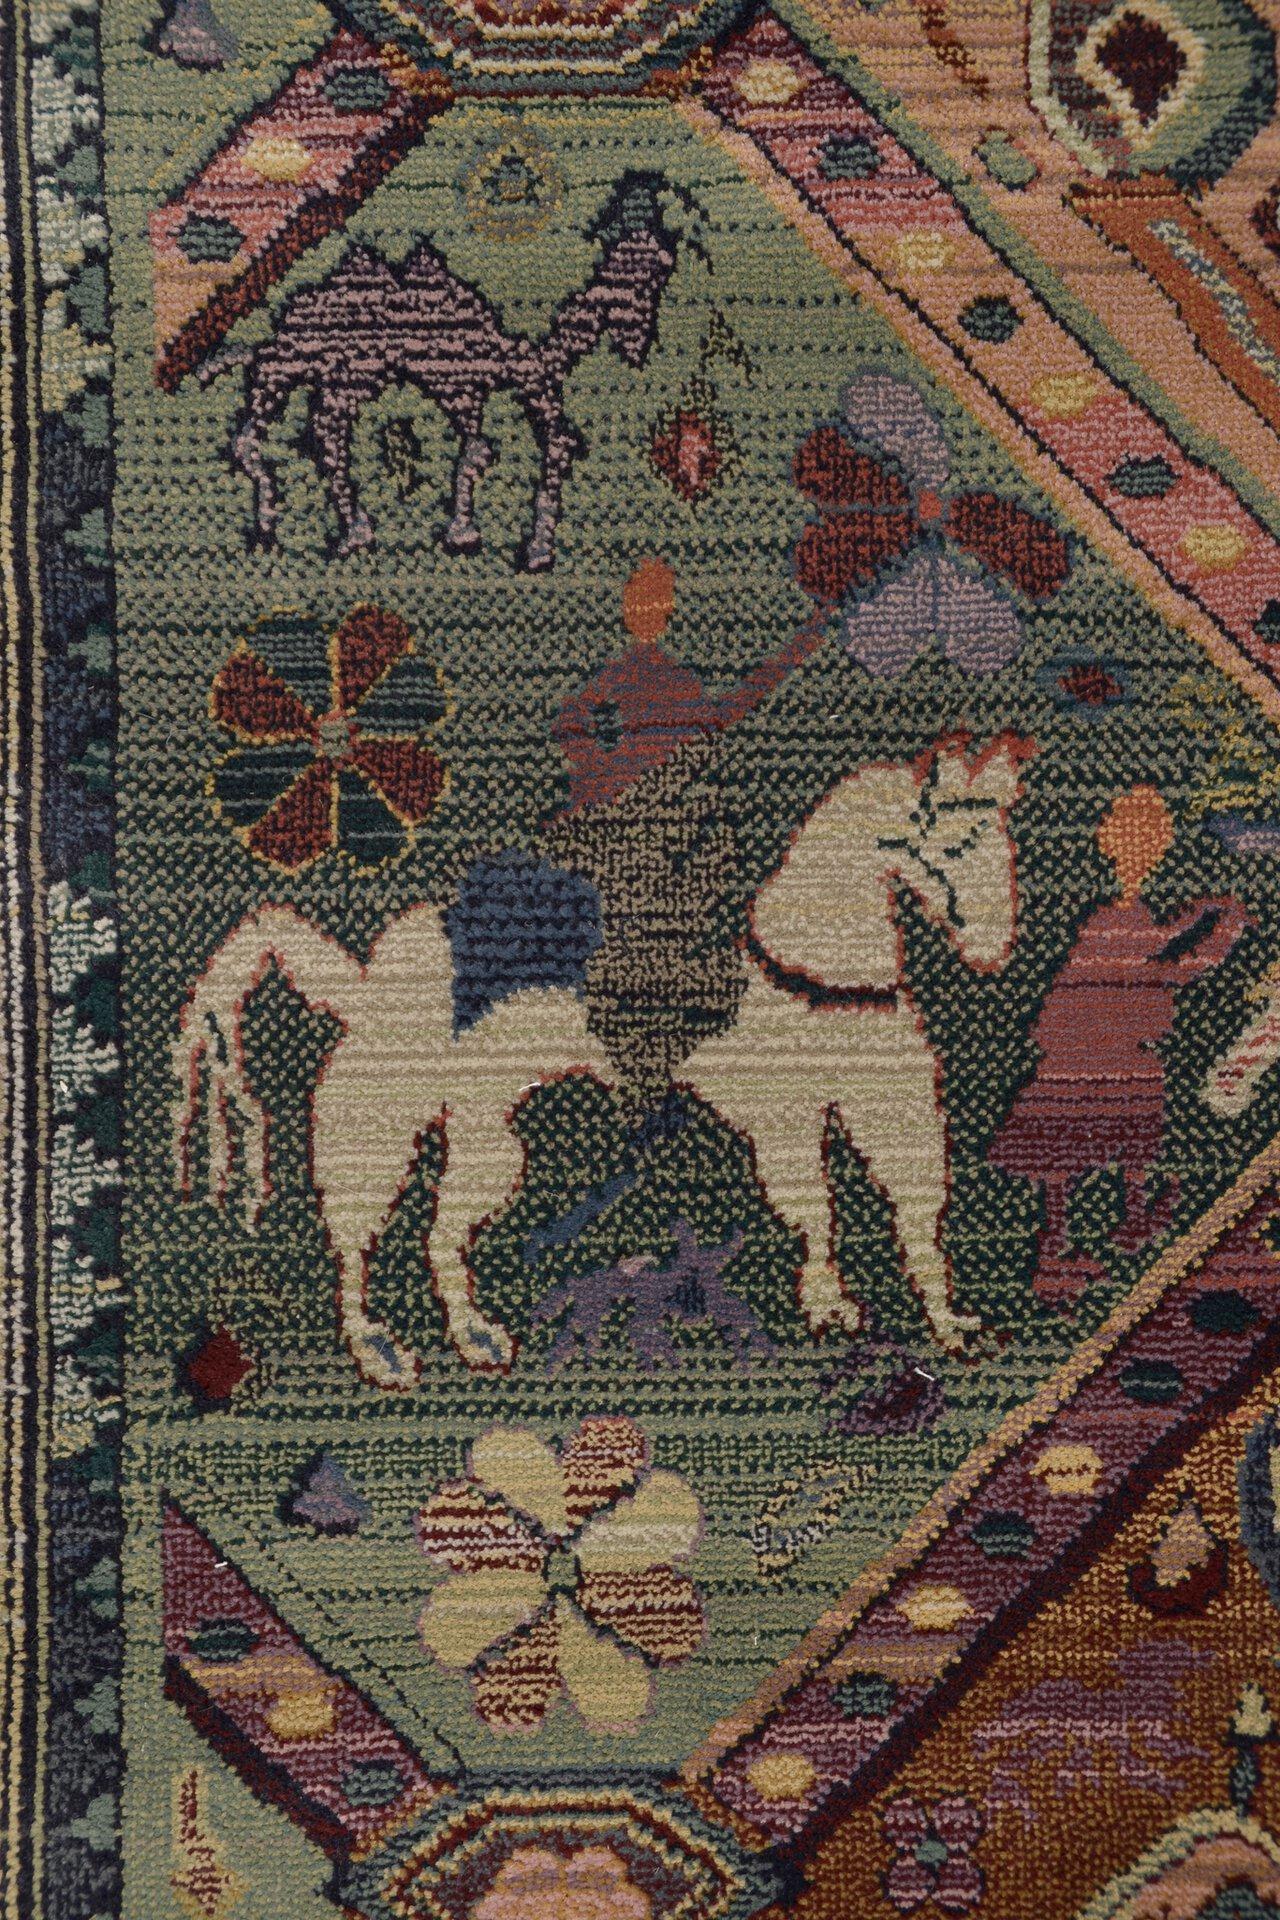 Maschinenwebteppich Gabiro Theko Textil grün 90 x 160 cm